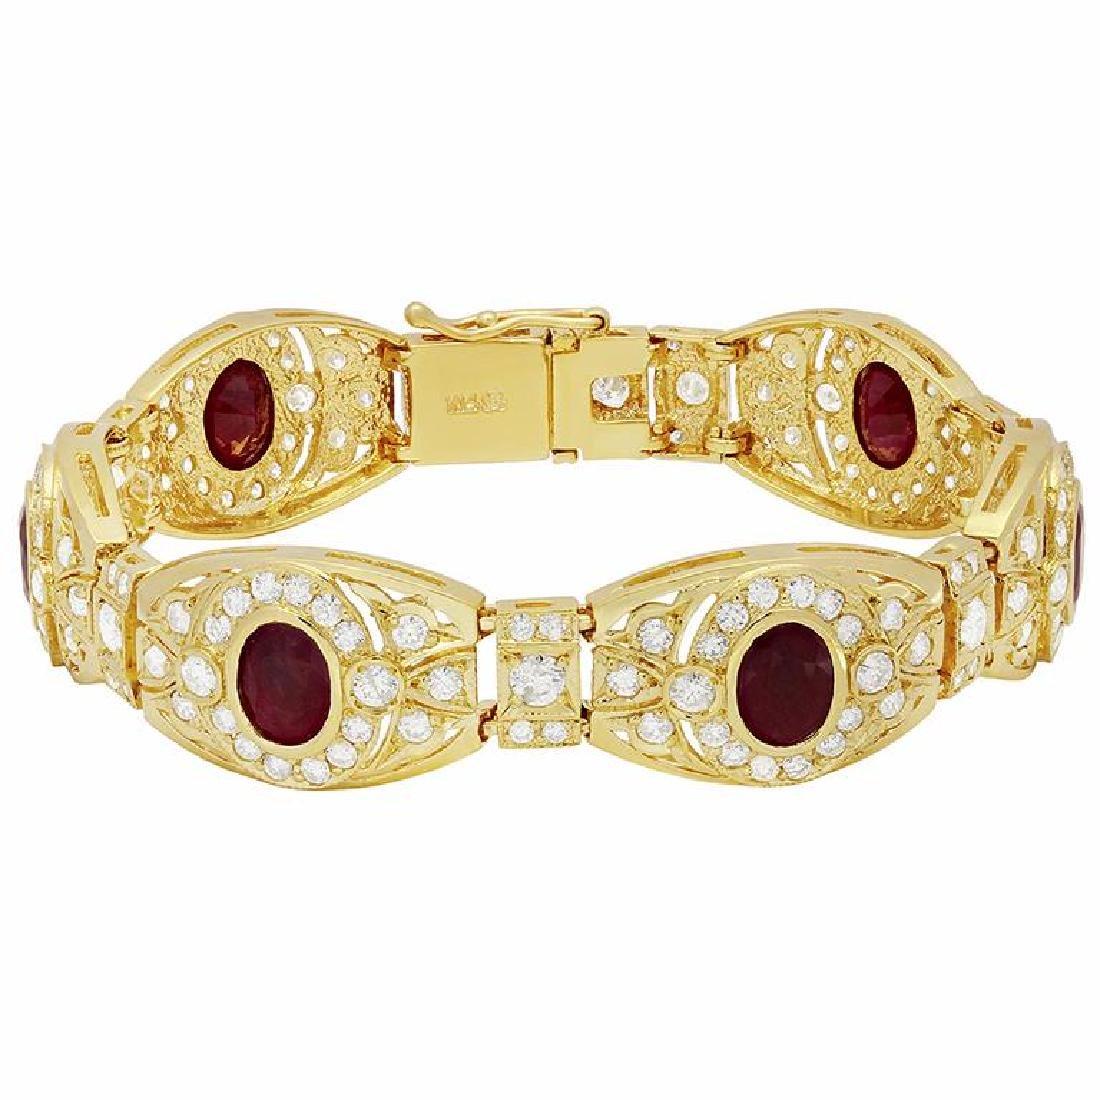 14k Yellow Gold 10.07ct Ruby 7.44ct Diamond Bracelet